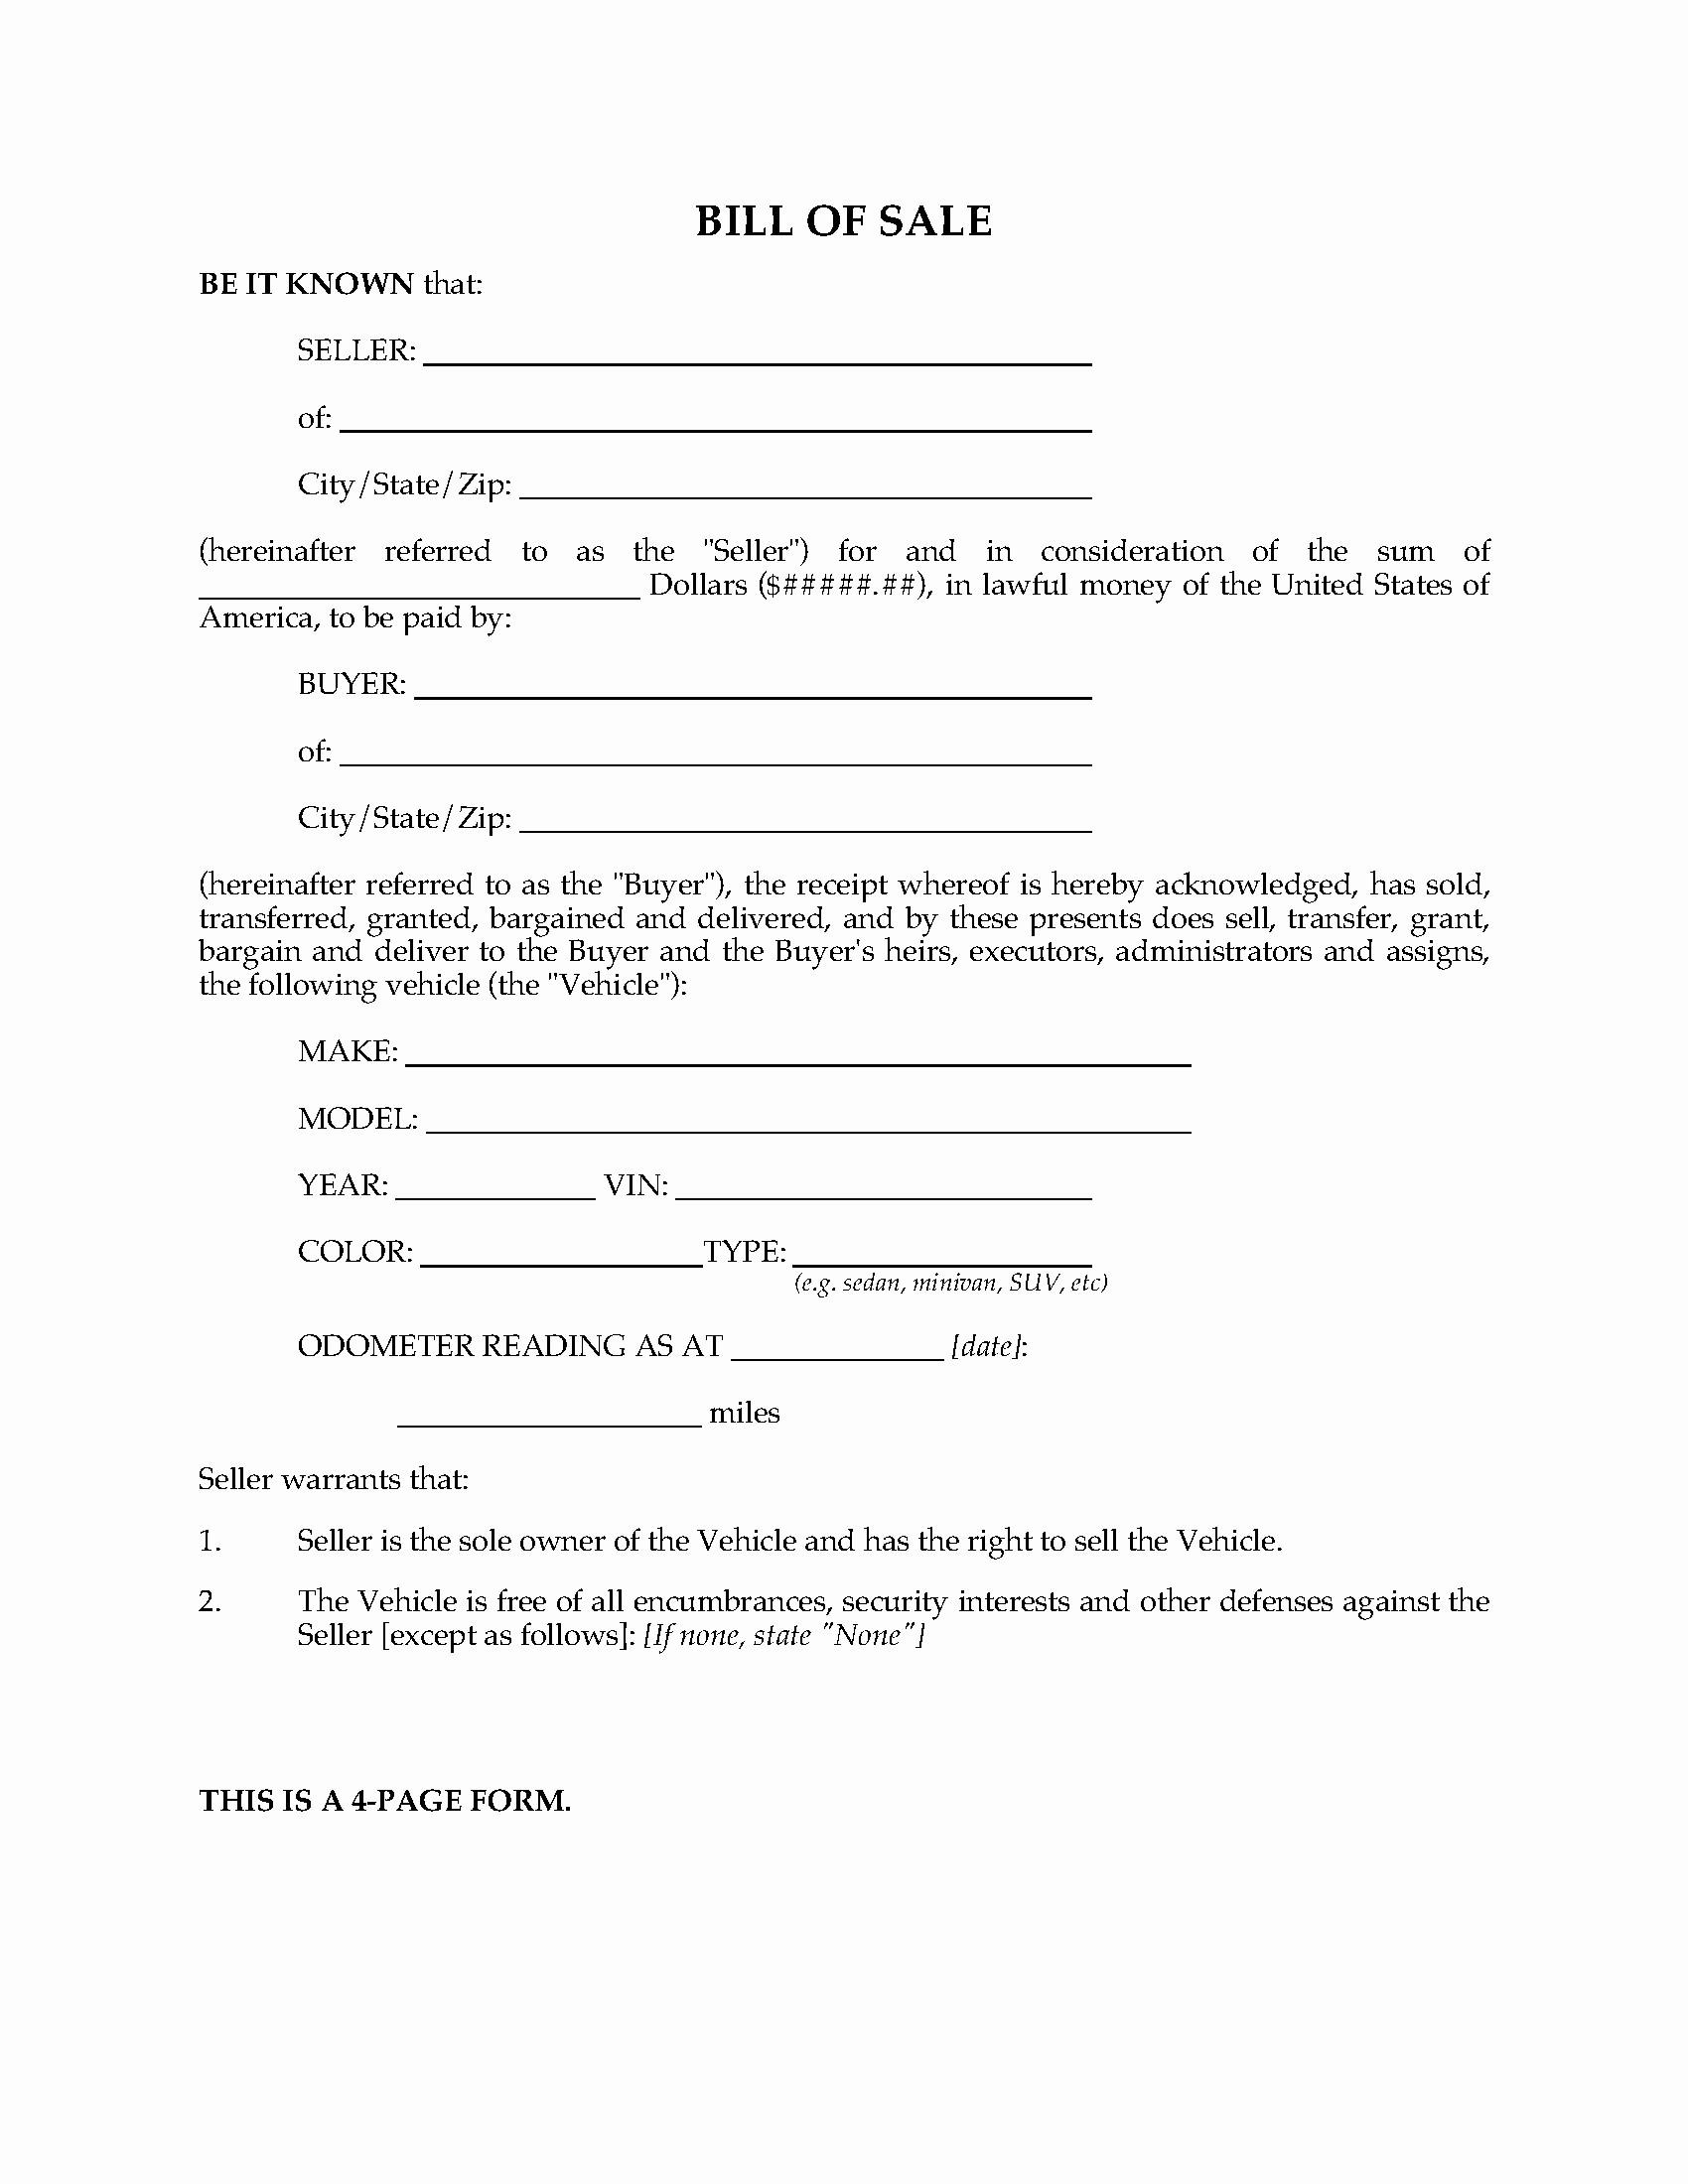 Automotive Bill Of Sale California Unique Usa Vehicle Bill Of Sale form